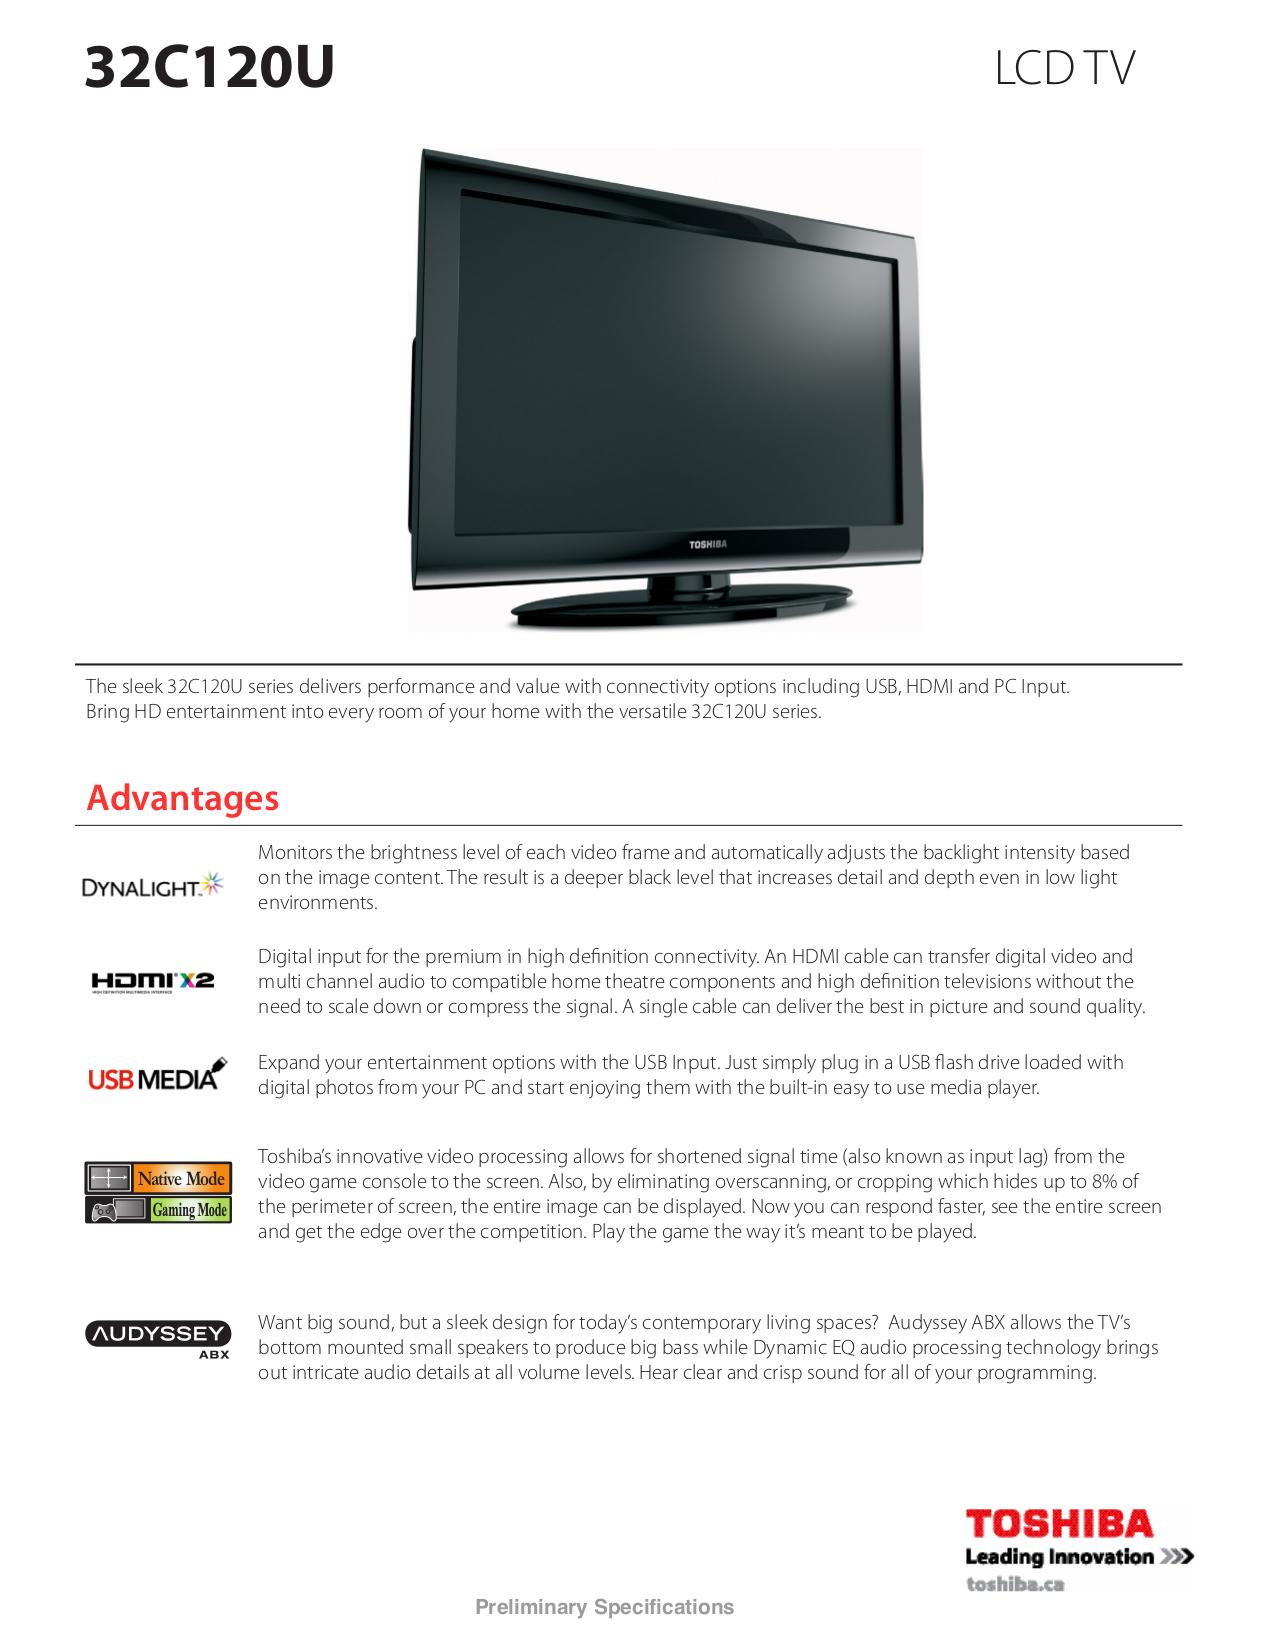 download free pdf for toshiba 32c120u tv manual rh umlib com Toshiba 32C120U Manual toshiba model 32c110u manual